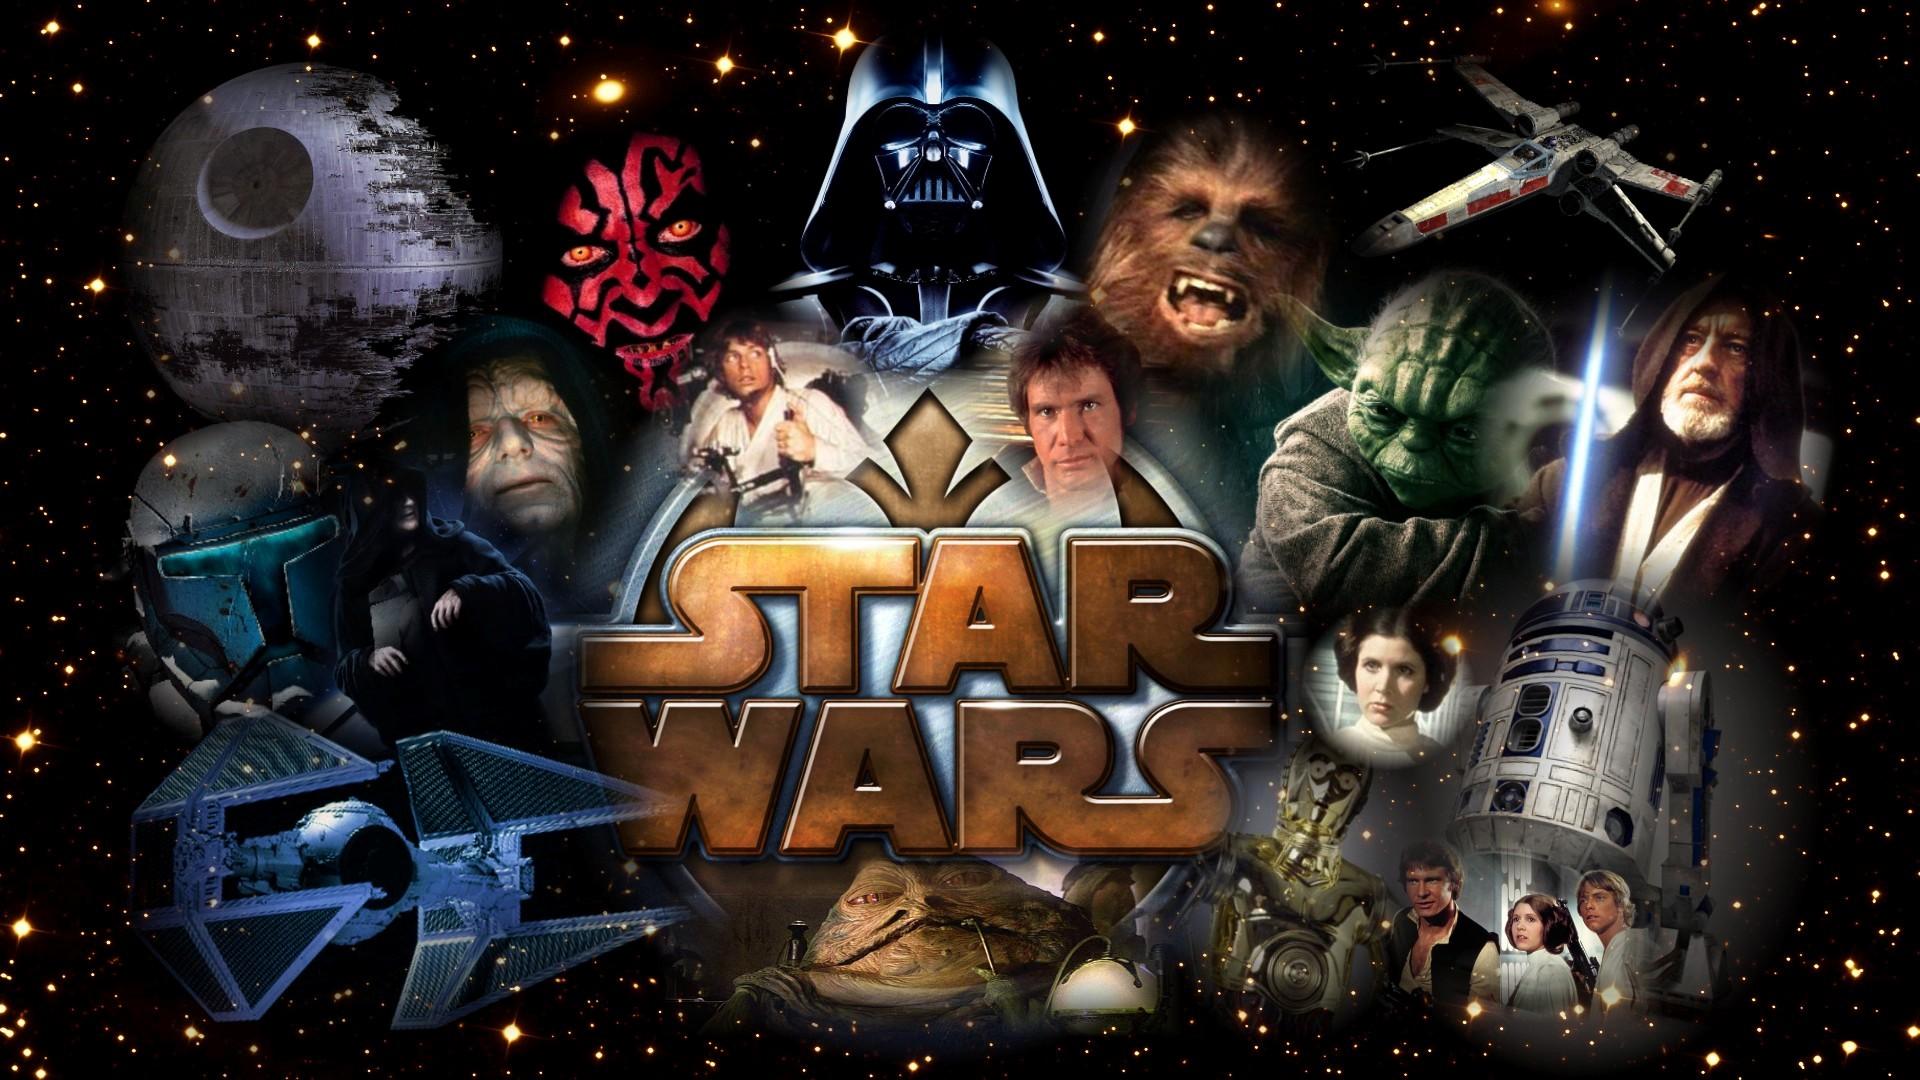 Novidades em Star Wars   Portal 42Portal 42 1920x1080